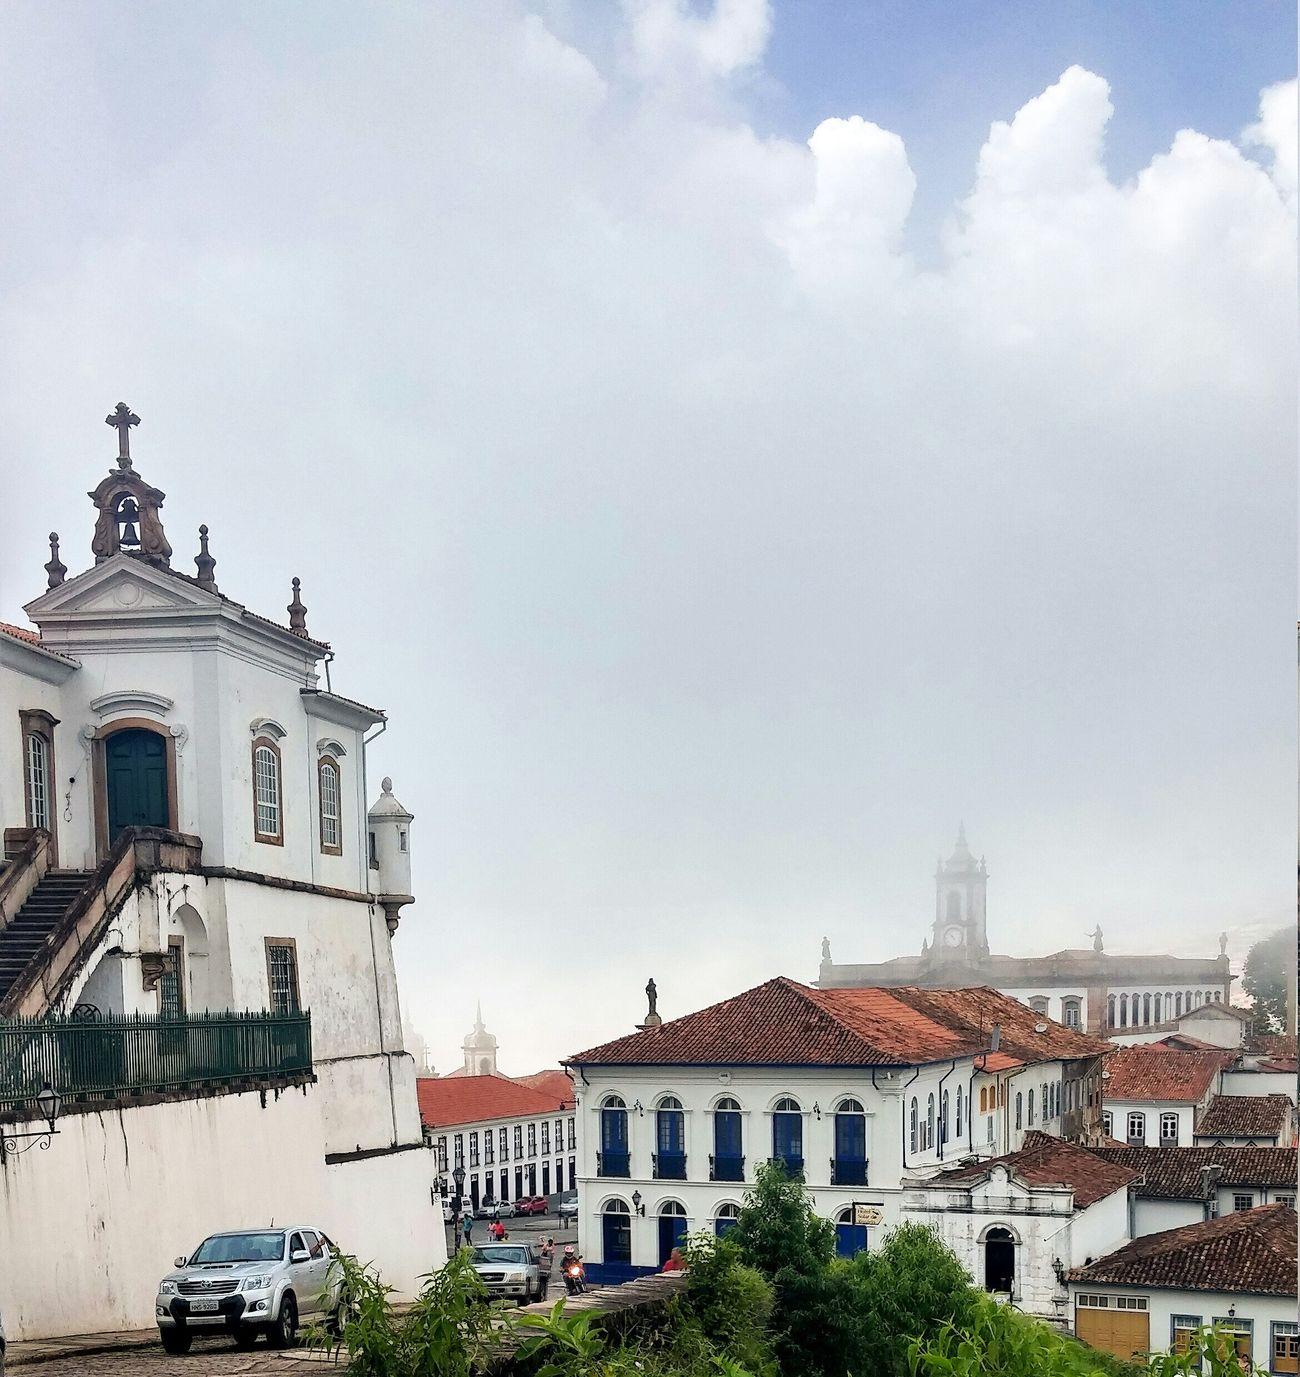 Ouropreto Minasgerais Brazil LG G3 City Landscape Historic City Historical Building Colonial Architecture Architecture